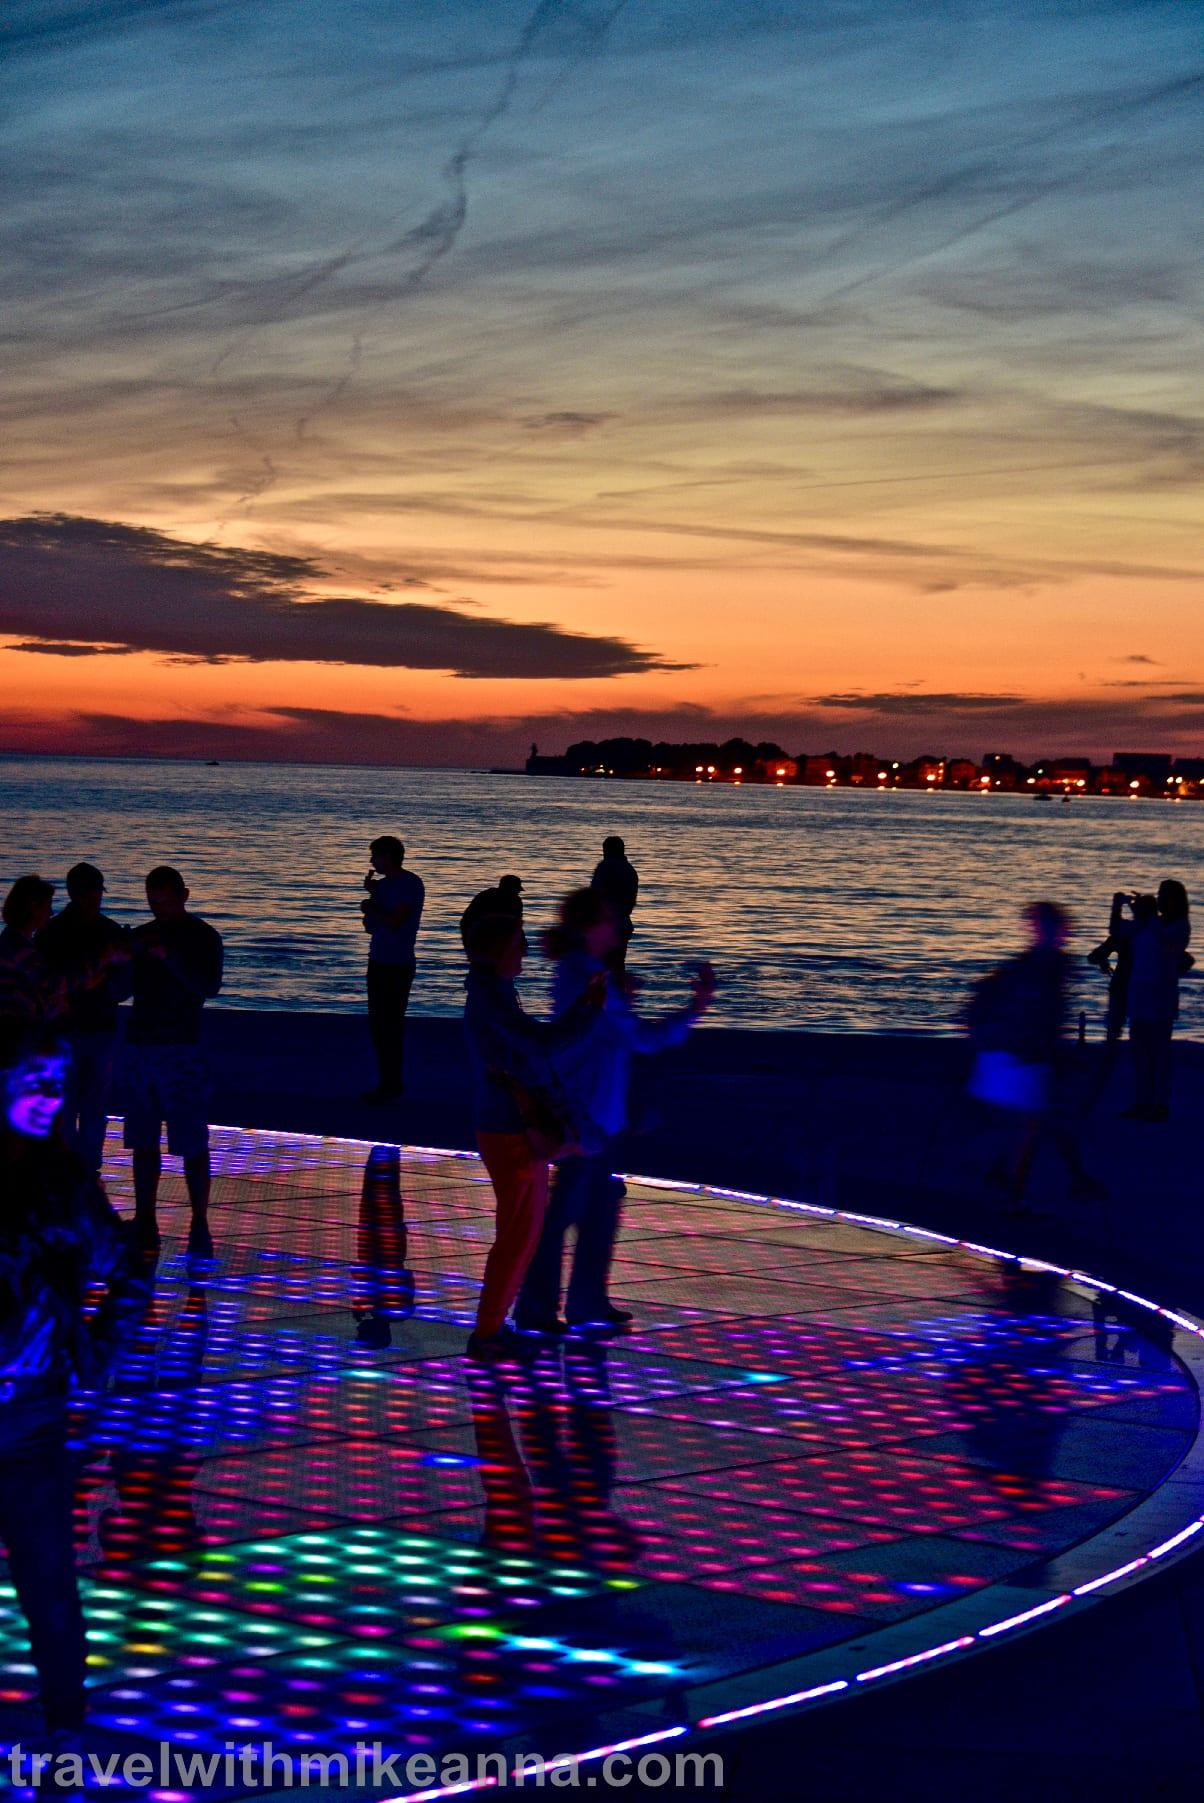 Croatia Zadar Sunset travel photography 克羅埃西亞 歐洲最美夕陽Zadar 古城 夕陽 攝影